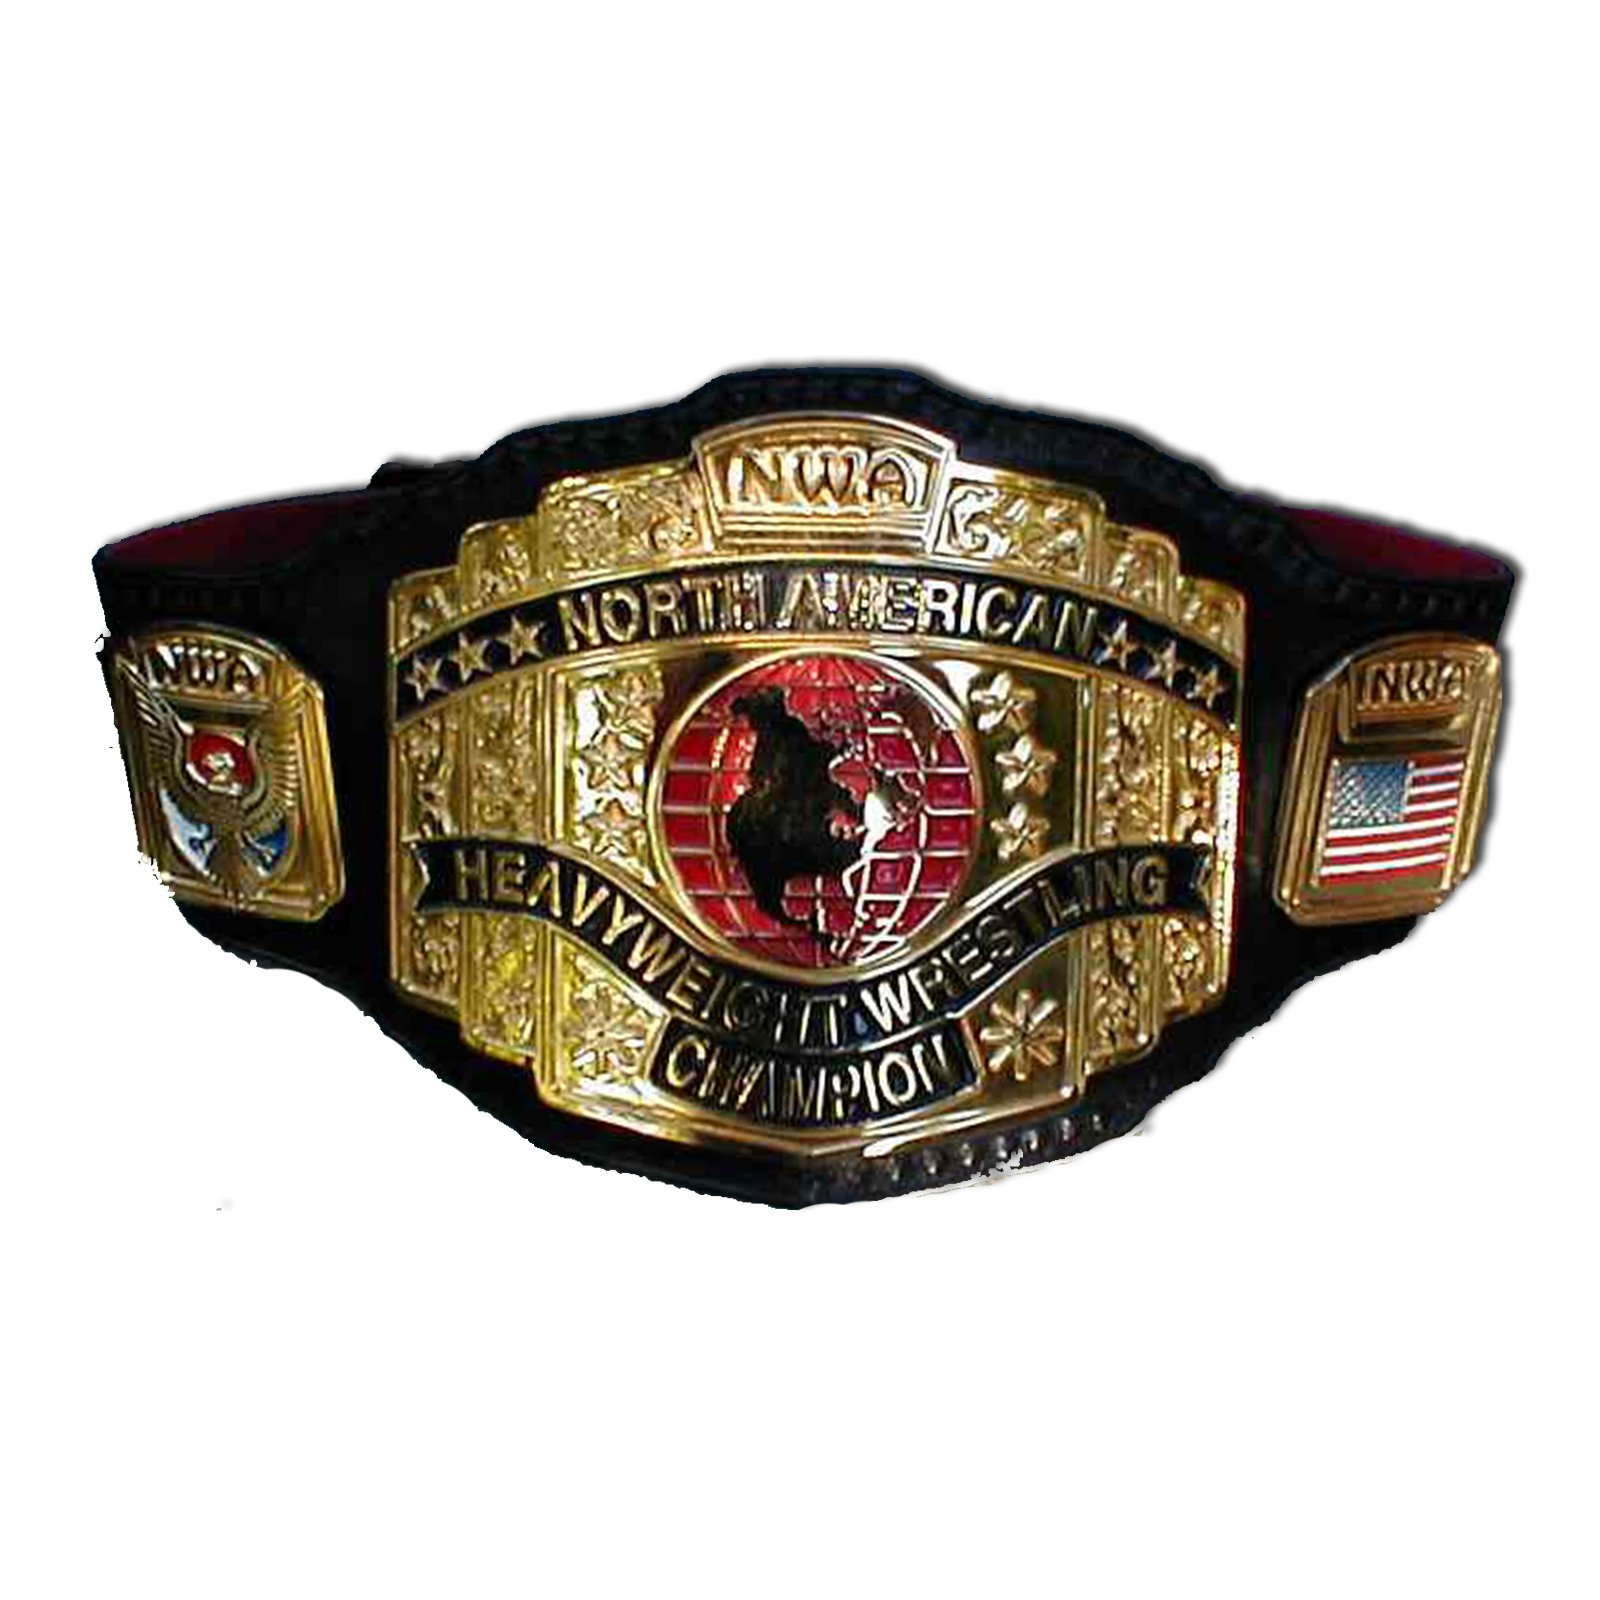 N.W.A. North American Heavyweight Wrestling Championship Replica Title Belt - Brass Metal 4mm Plates